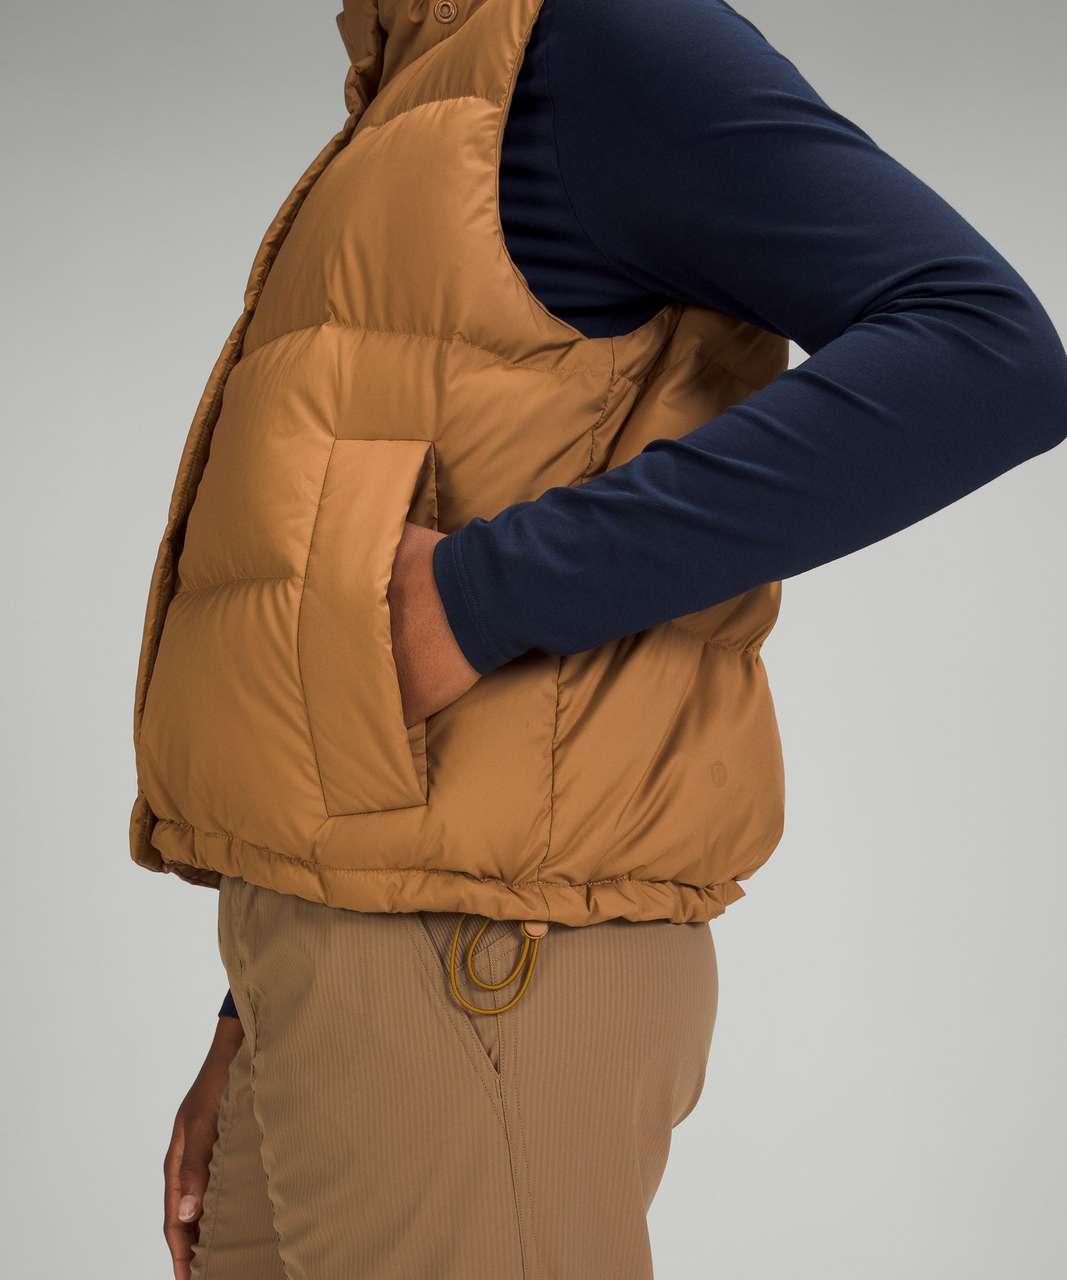 Lululemon Wunder Puff Crop Vest - Bold Beige